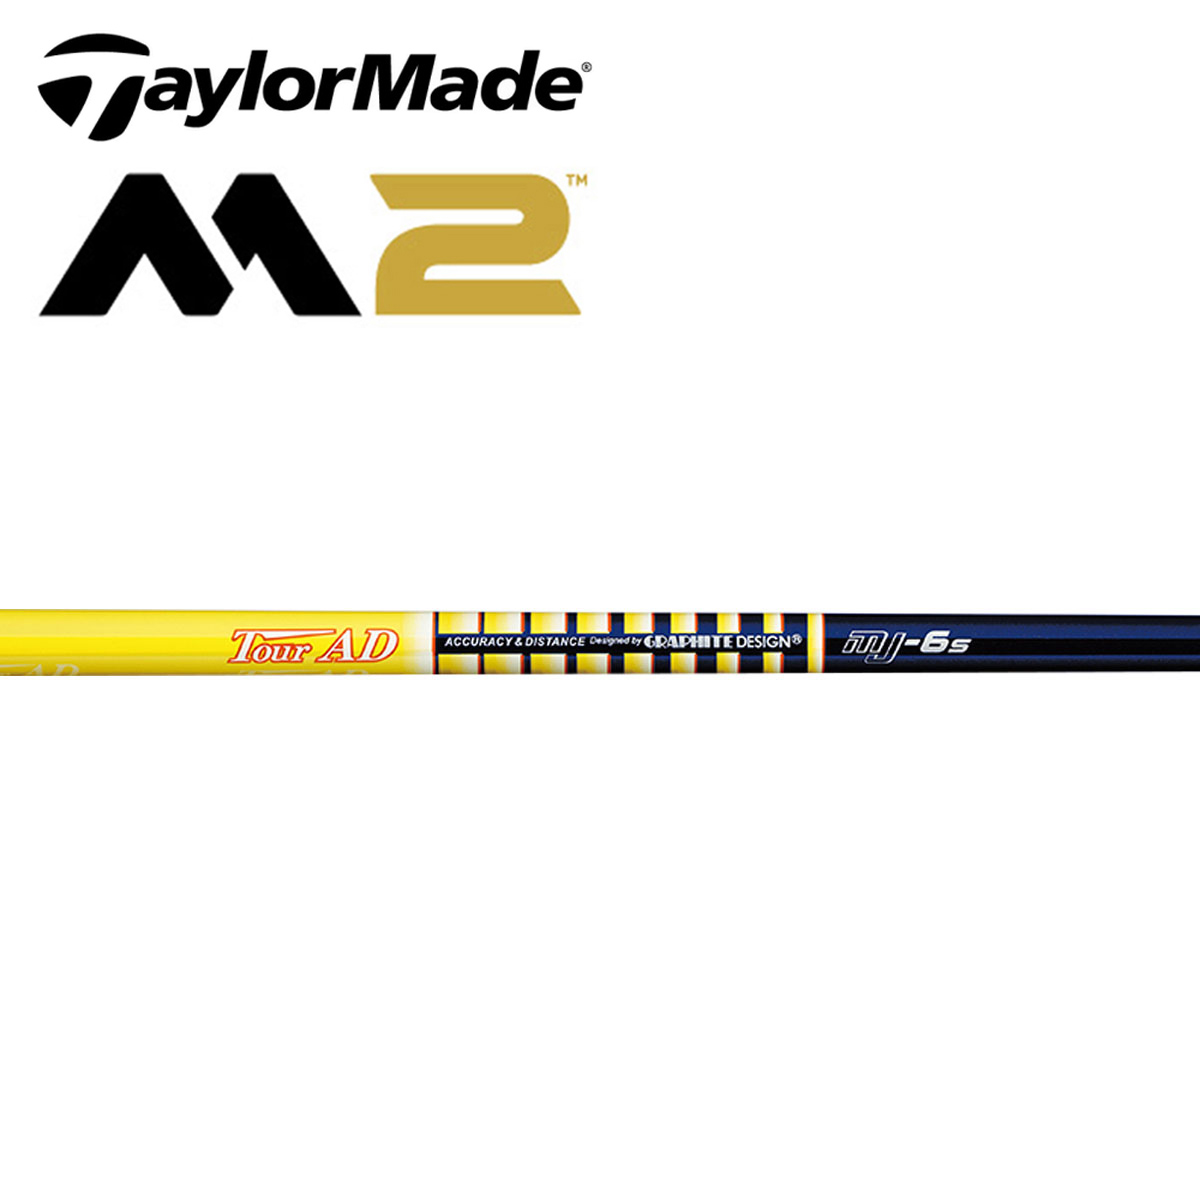 Tour AD MJシリーズ M2 ドライバーロフト12度用スリーブ付きシャフト 2016年モデル【テーラーメイド専用】